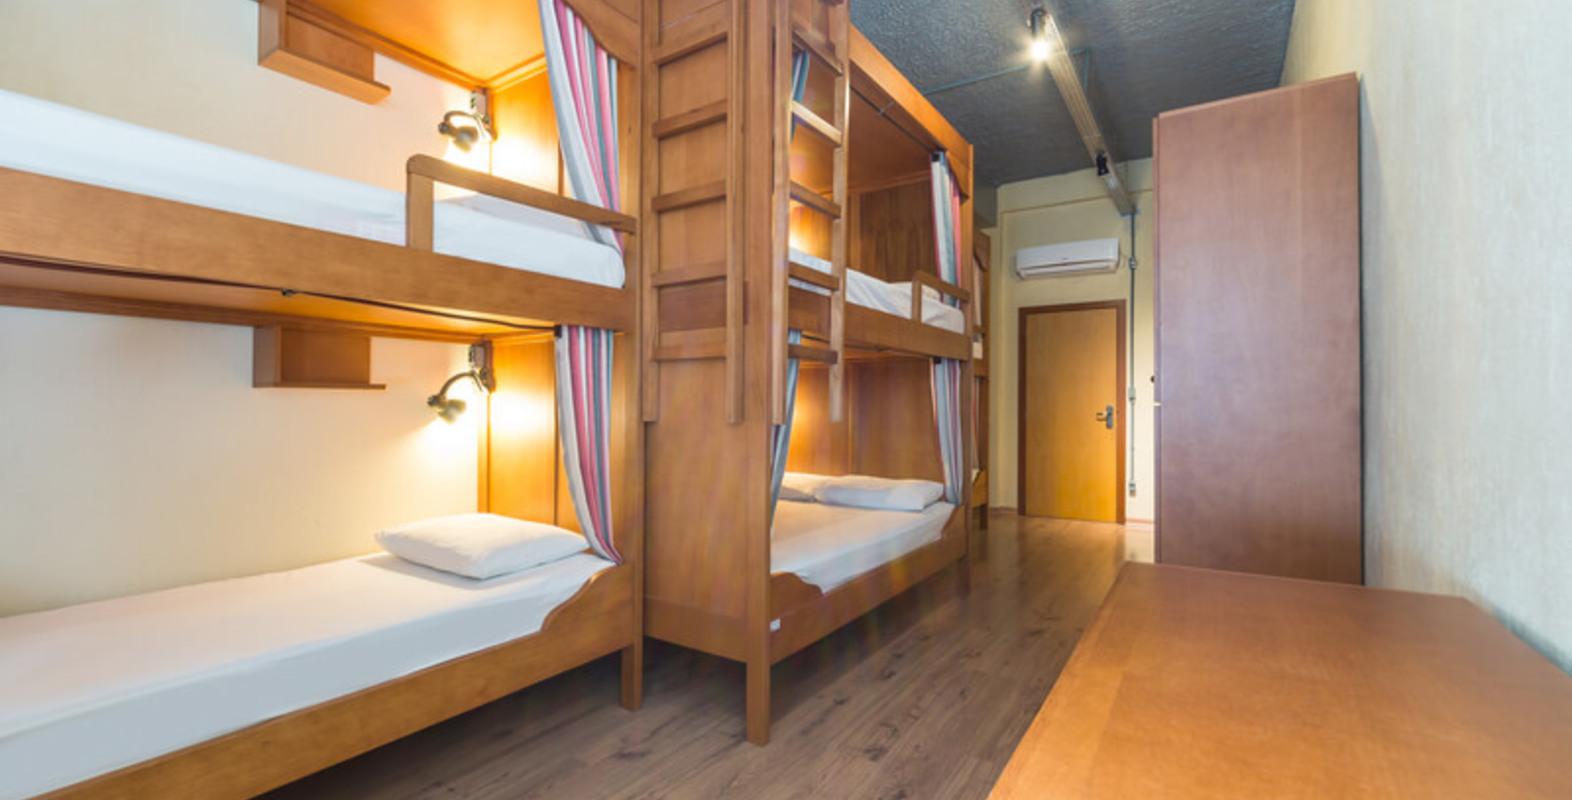 camas coletivo2 (1).jpeg